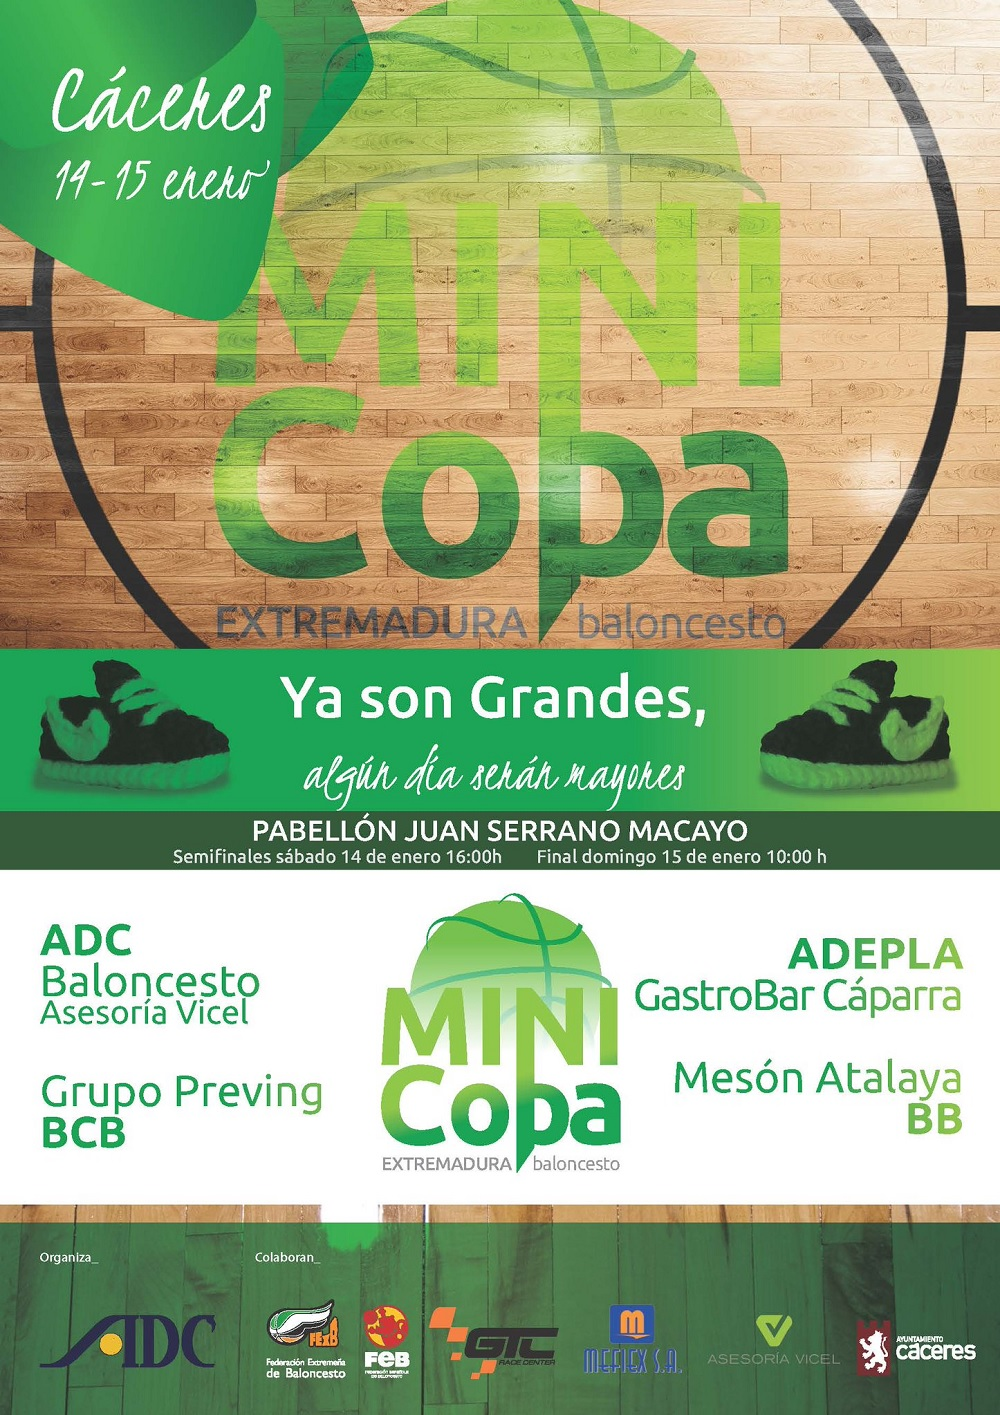 Mini Copa de Extremadura